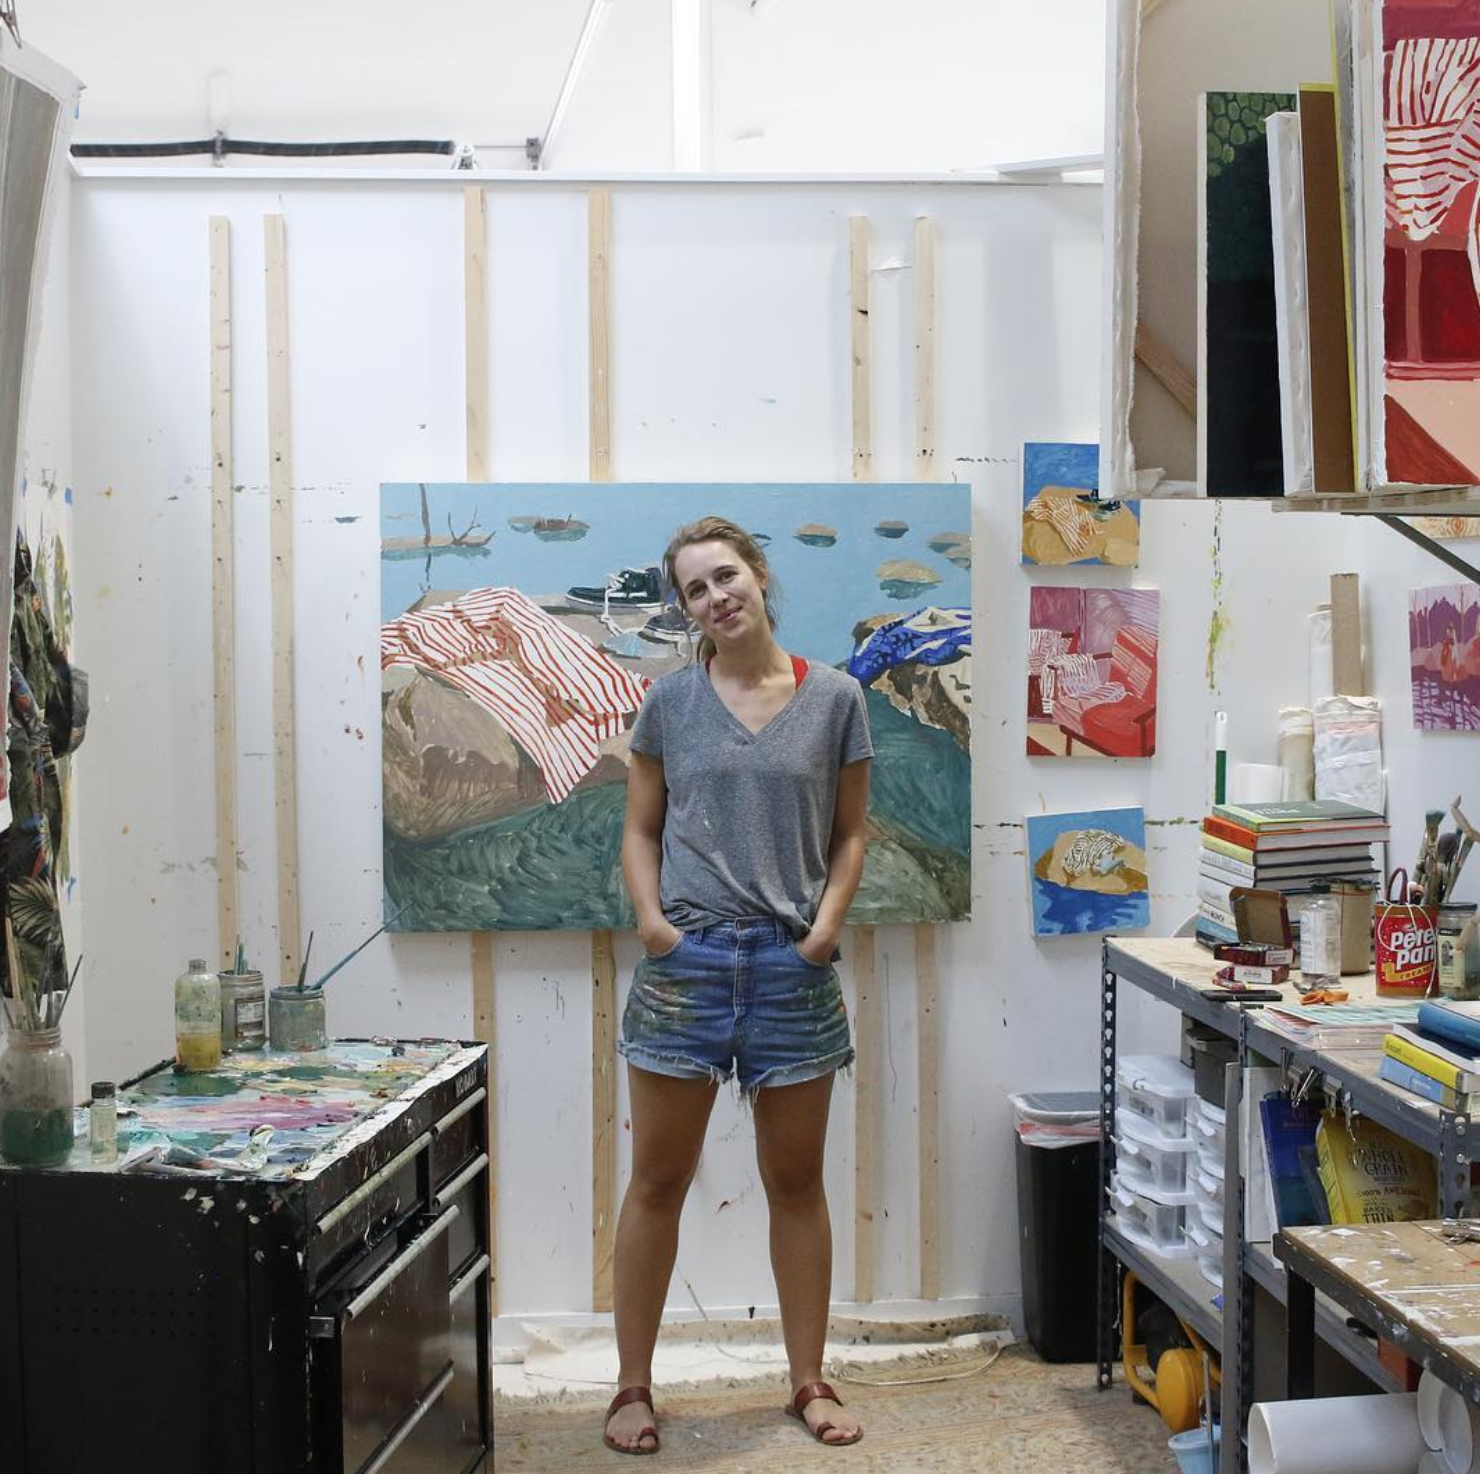 ARTIST SOPHIE TREPPENDAHL IN HER PRIVATE STUDIO